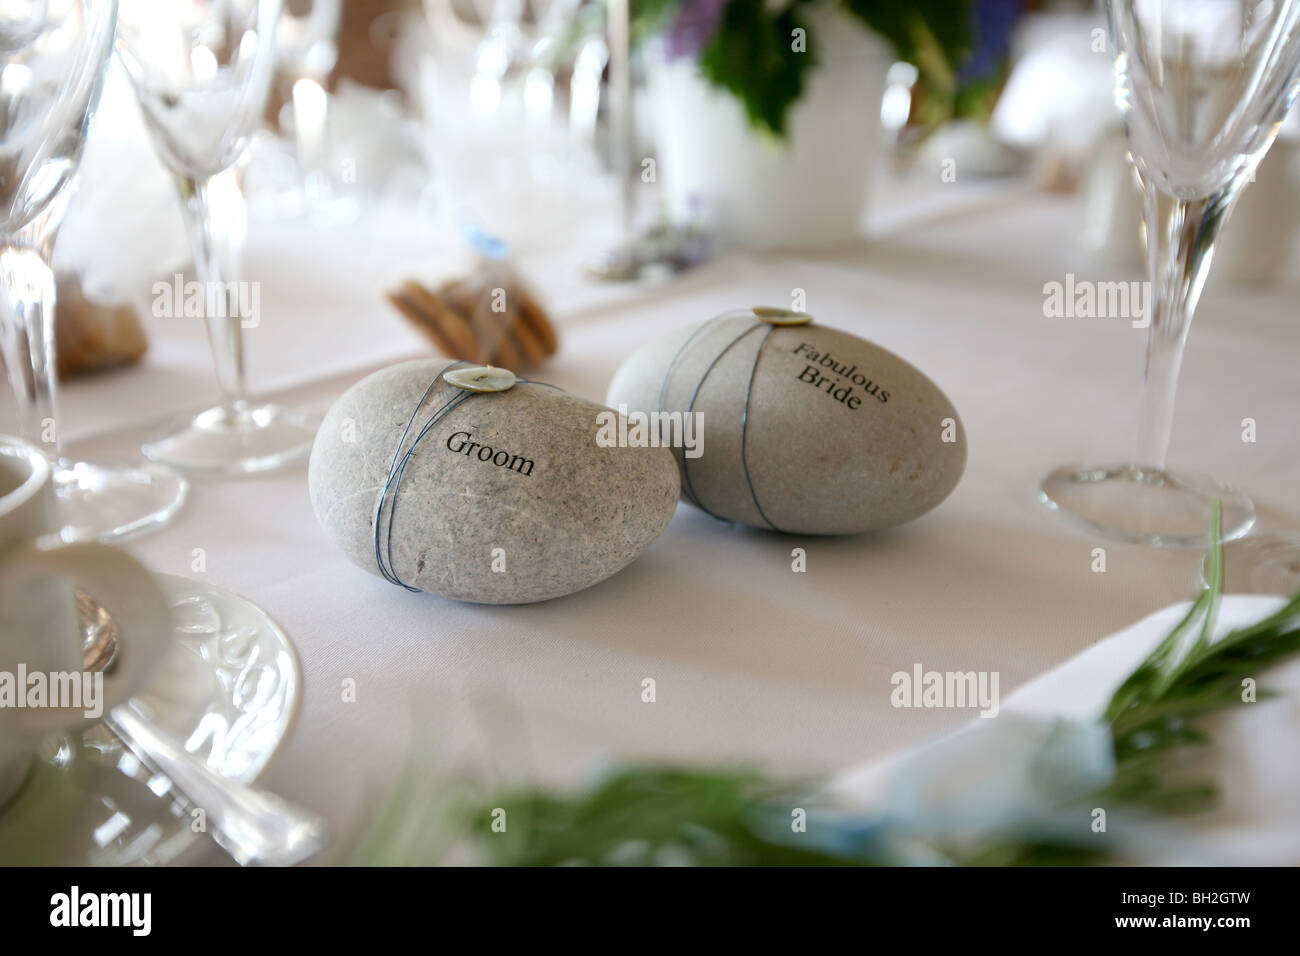 Wedding Stone Place Setting   Texts Reads U0027Groomu0027 And U0027Fabulous Brideu0027